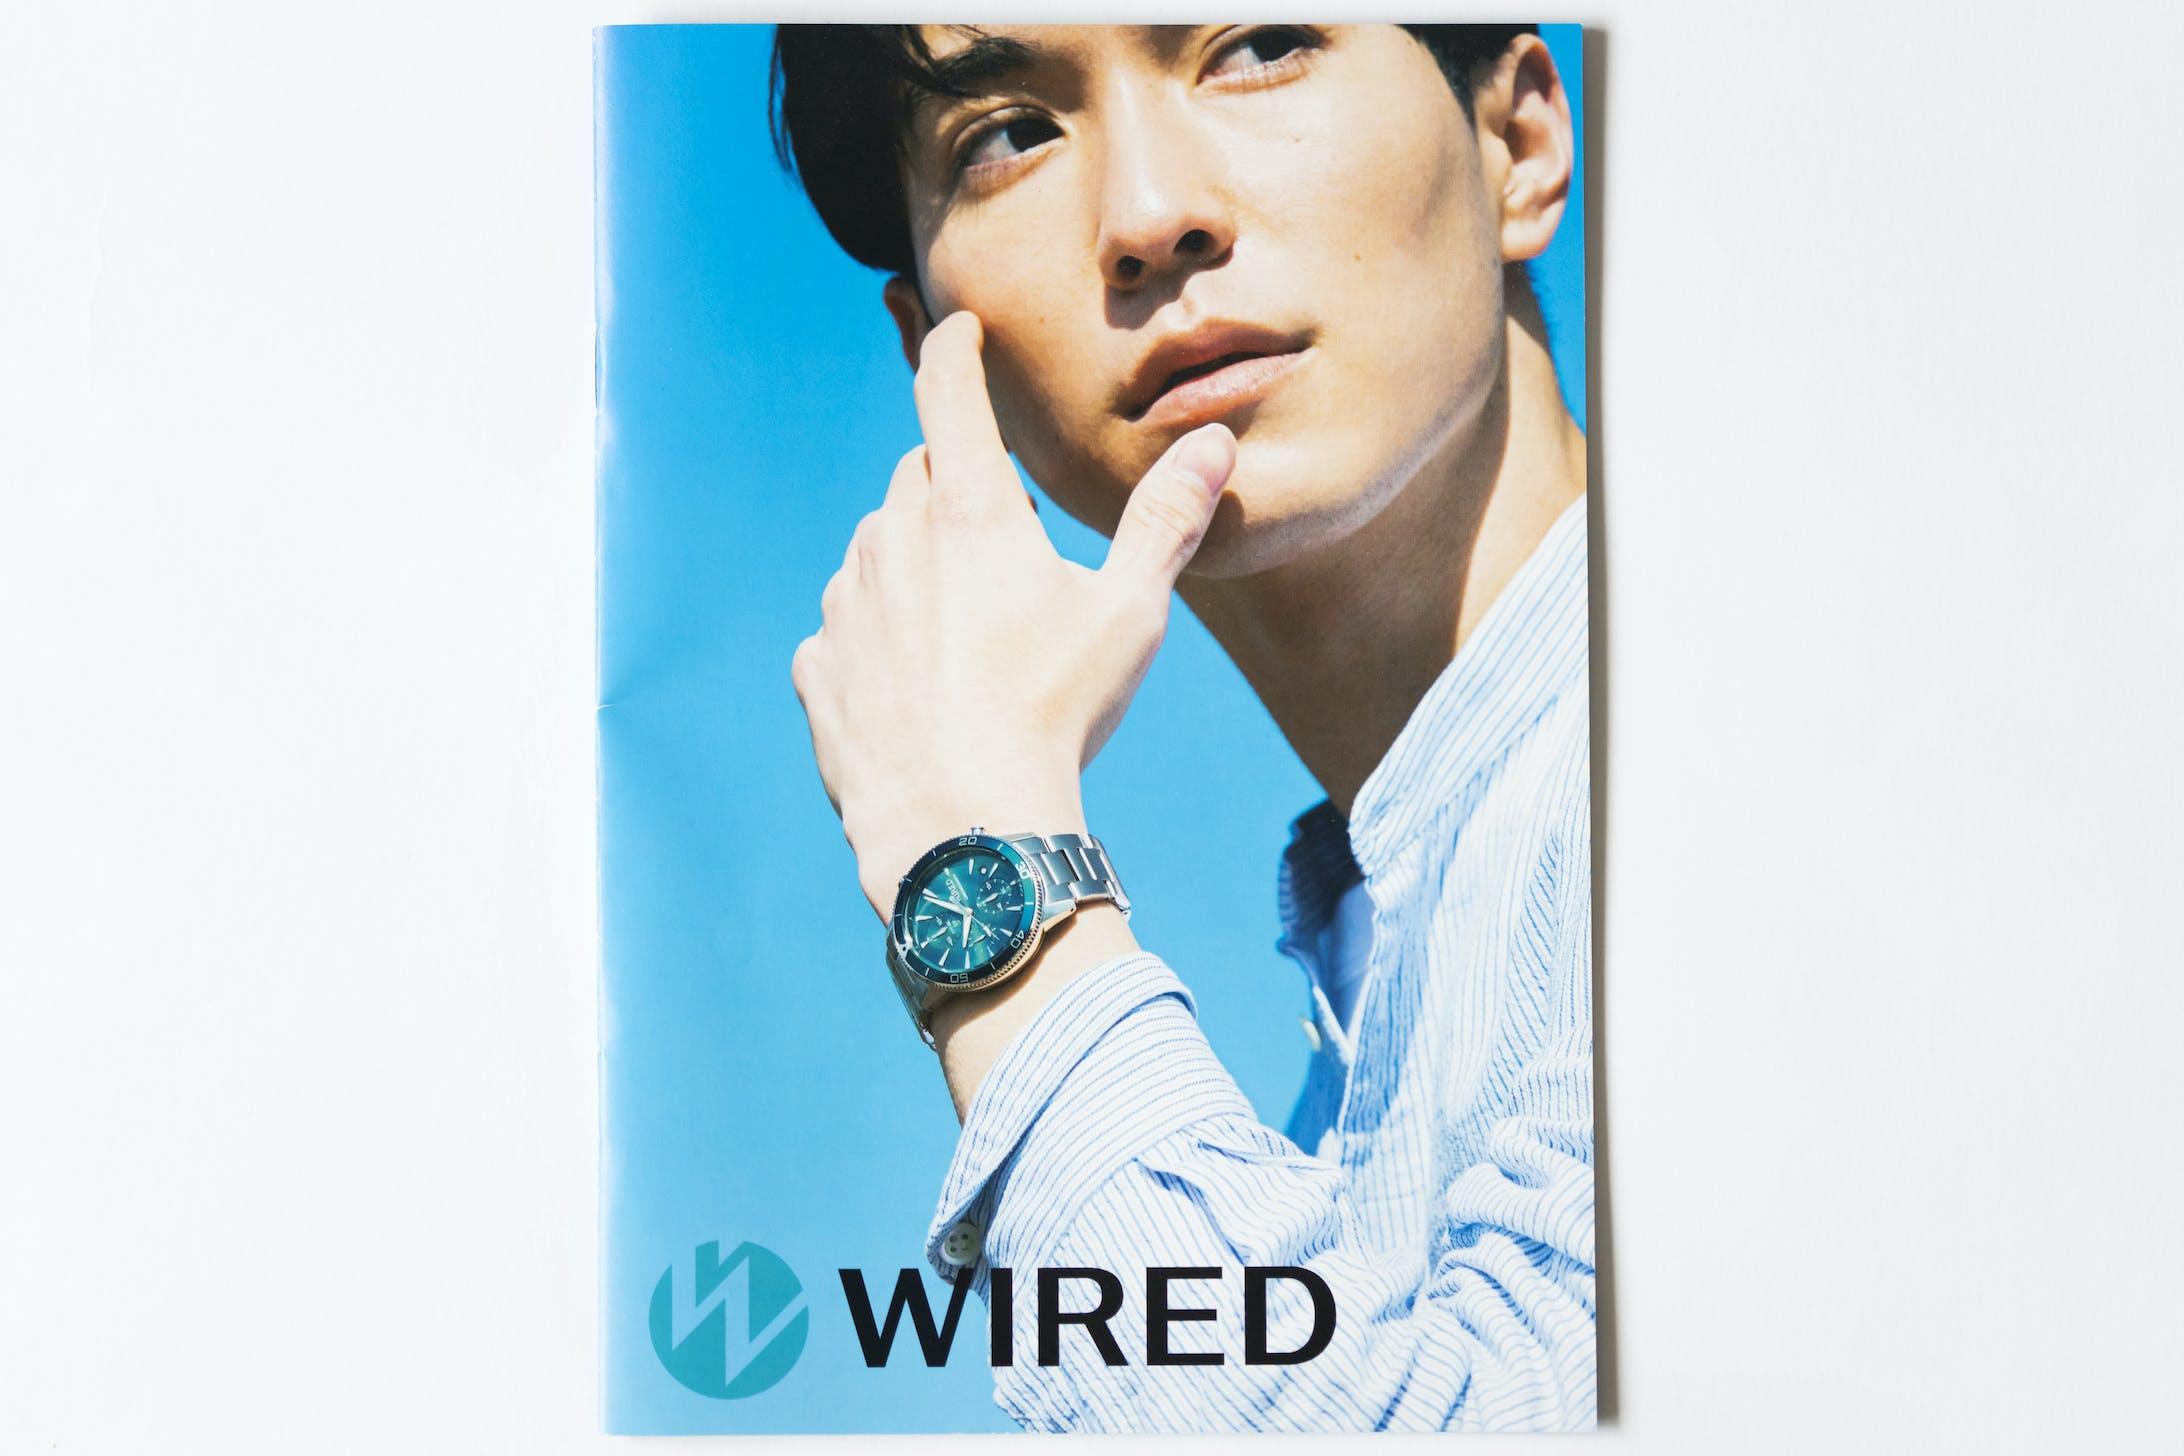 WIRED(セイコー株式会社)-1